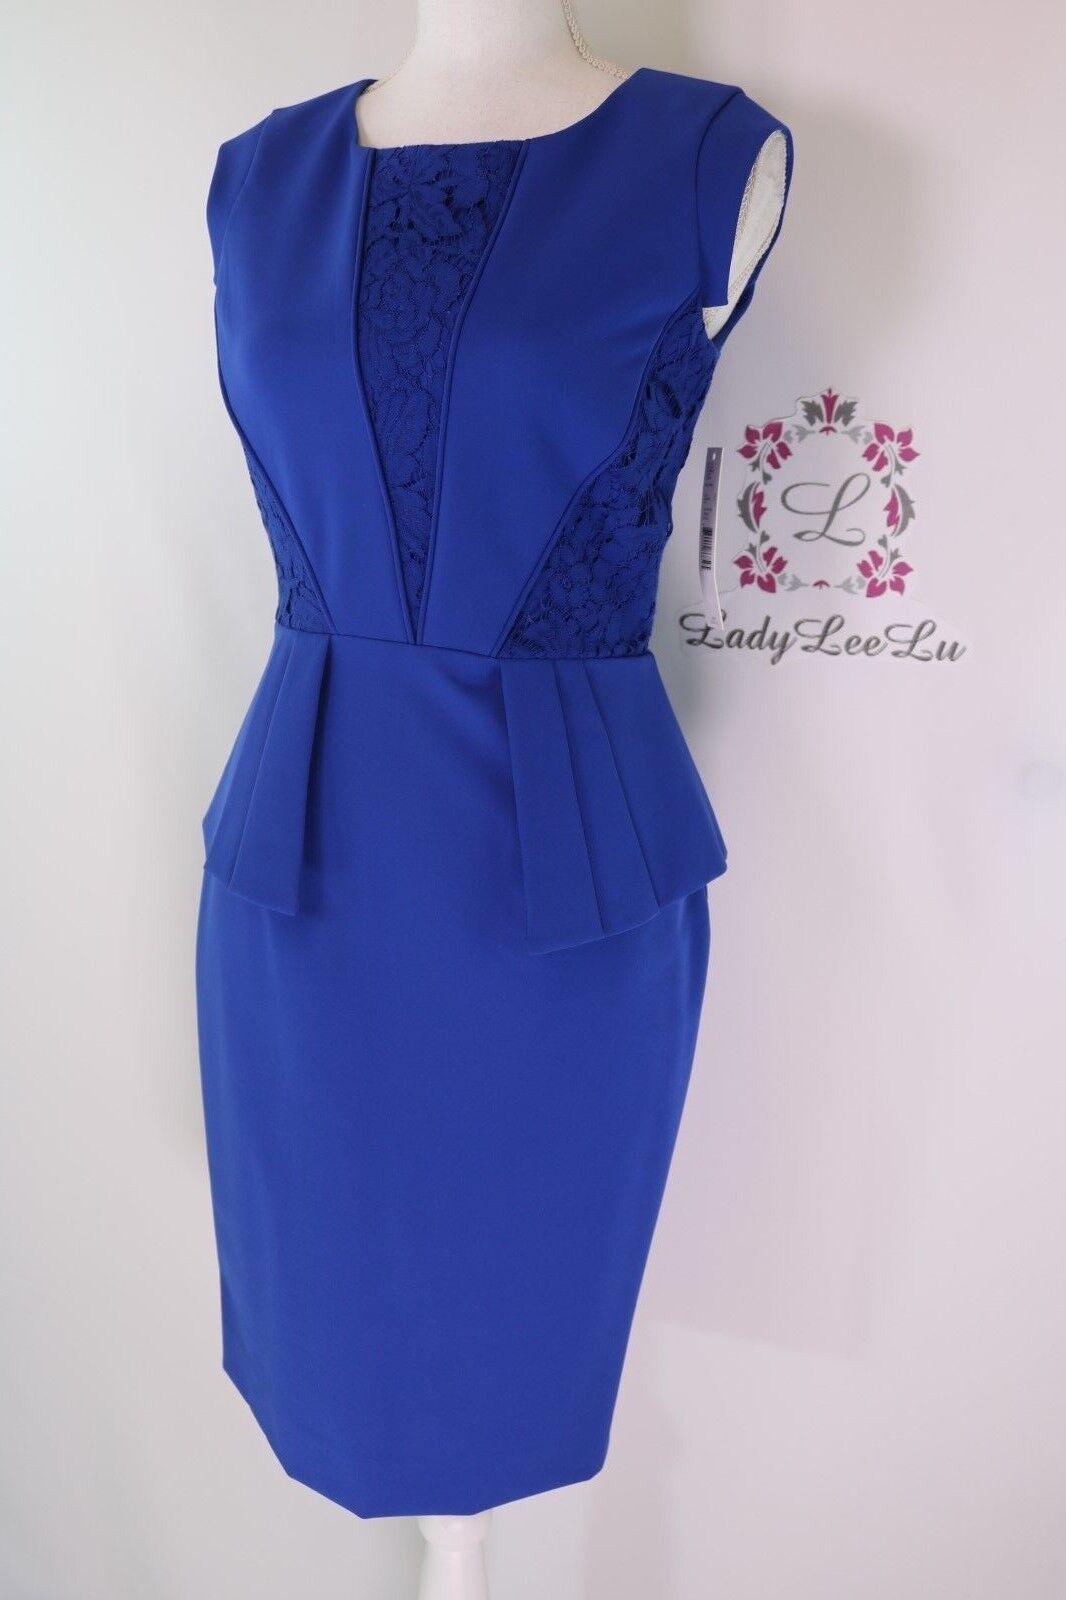 Antonio Melani Leigh Crepe Lace Dress Blauprint Größe 0 2 6 8 14 NEW NWT